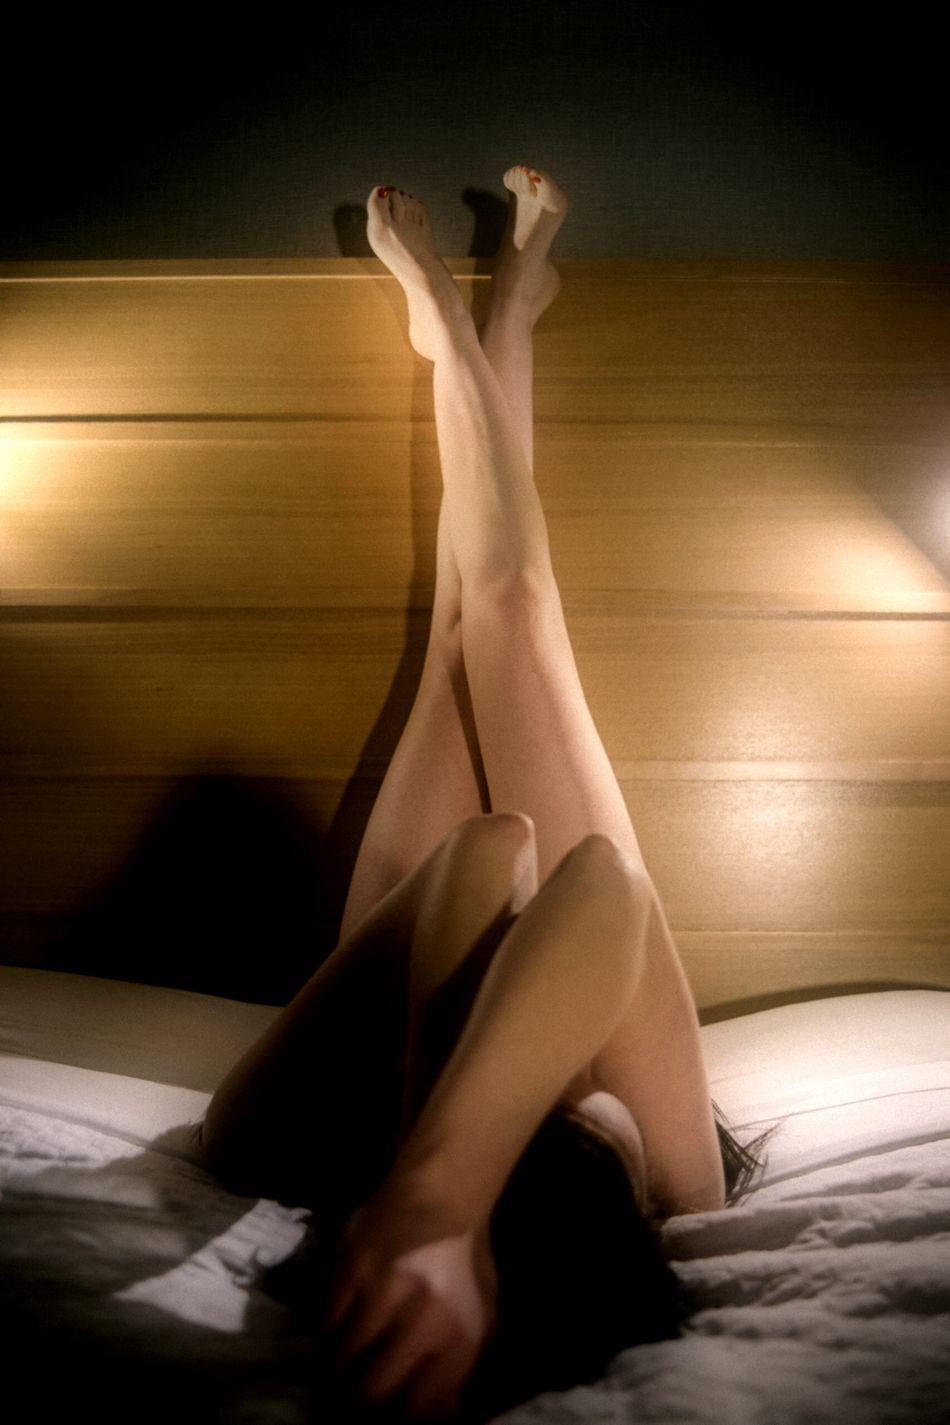 Model: Randi- Intimate Intimatehours Skintimatebeauty Intimate Light Source Nüde Art. Creative Light And Shadow